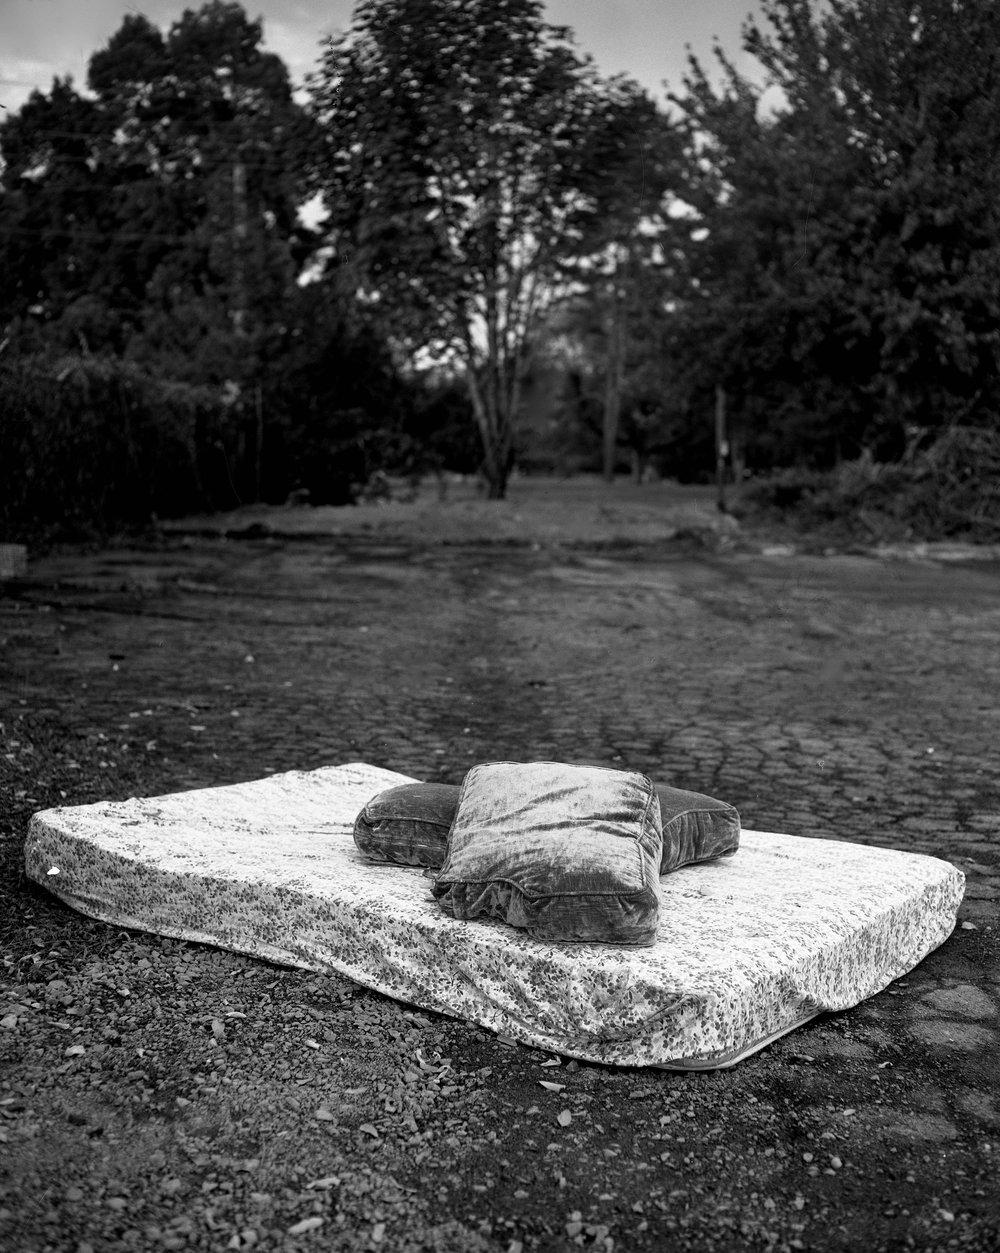 Abandoned mattress, Oregon